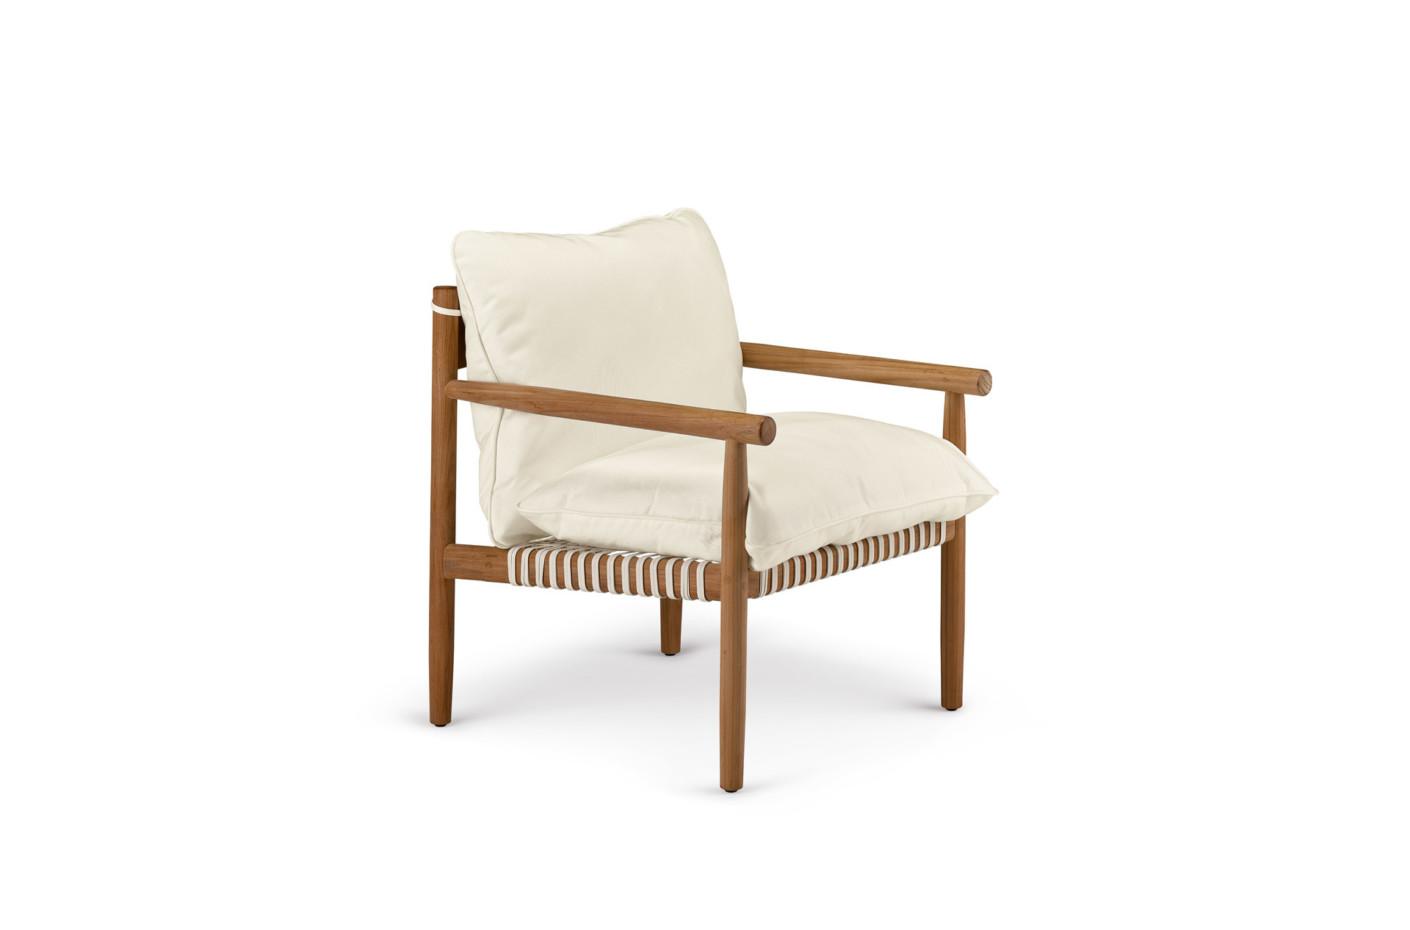 tibbo sessel von dedon stylepark. Black Bedroom Furniture Sets. Home Design Ideas